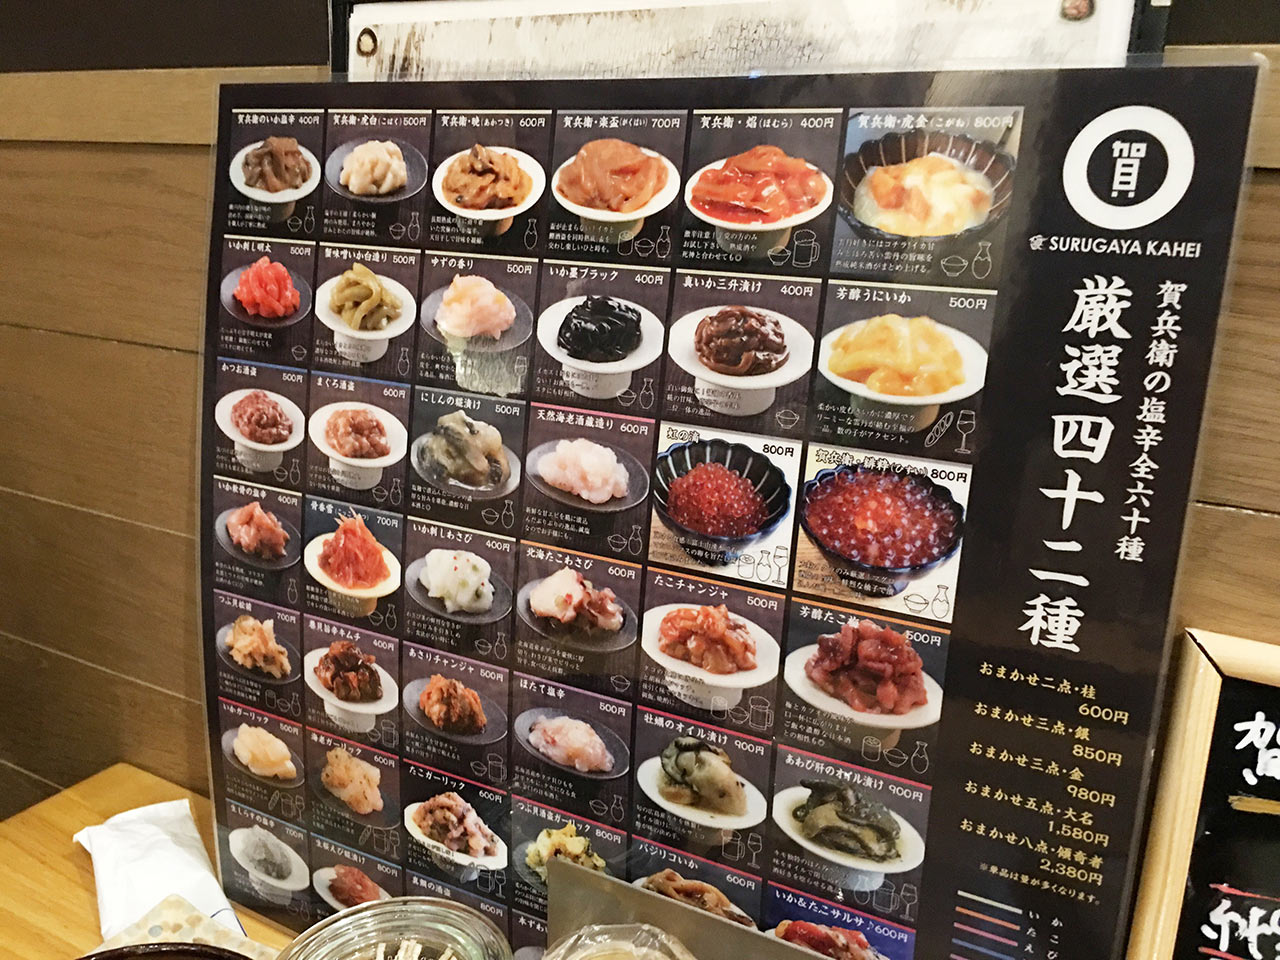 kawasaki-surugayakahei-menu02